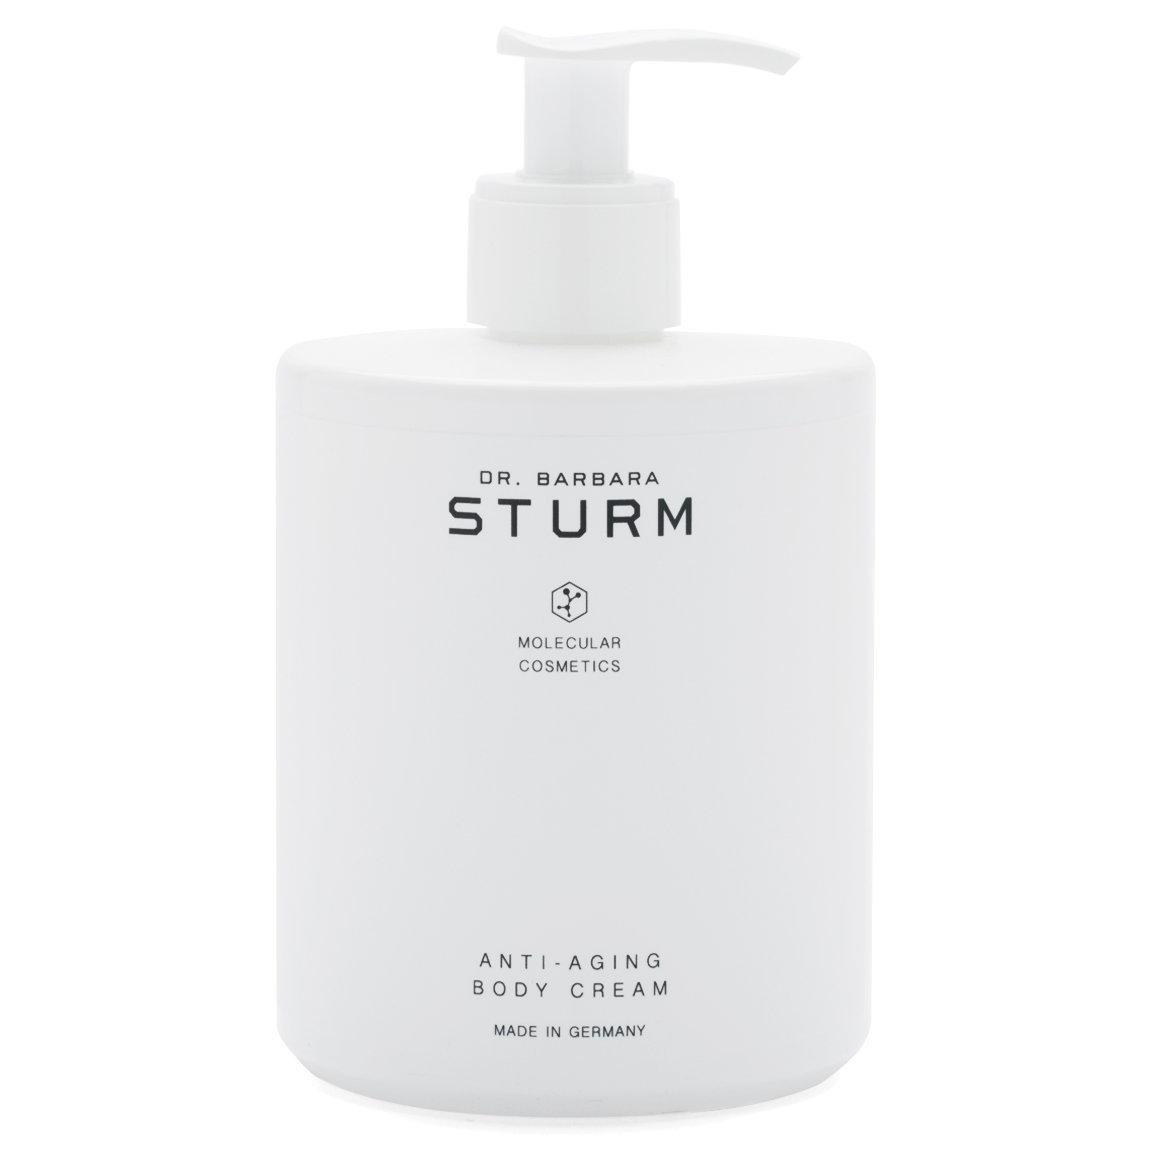 Dr. Barbara Sturm Anti-Aging Body Cream 500 ml alternative view 1 - product swatch.